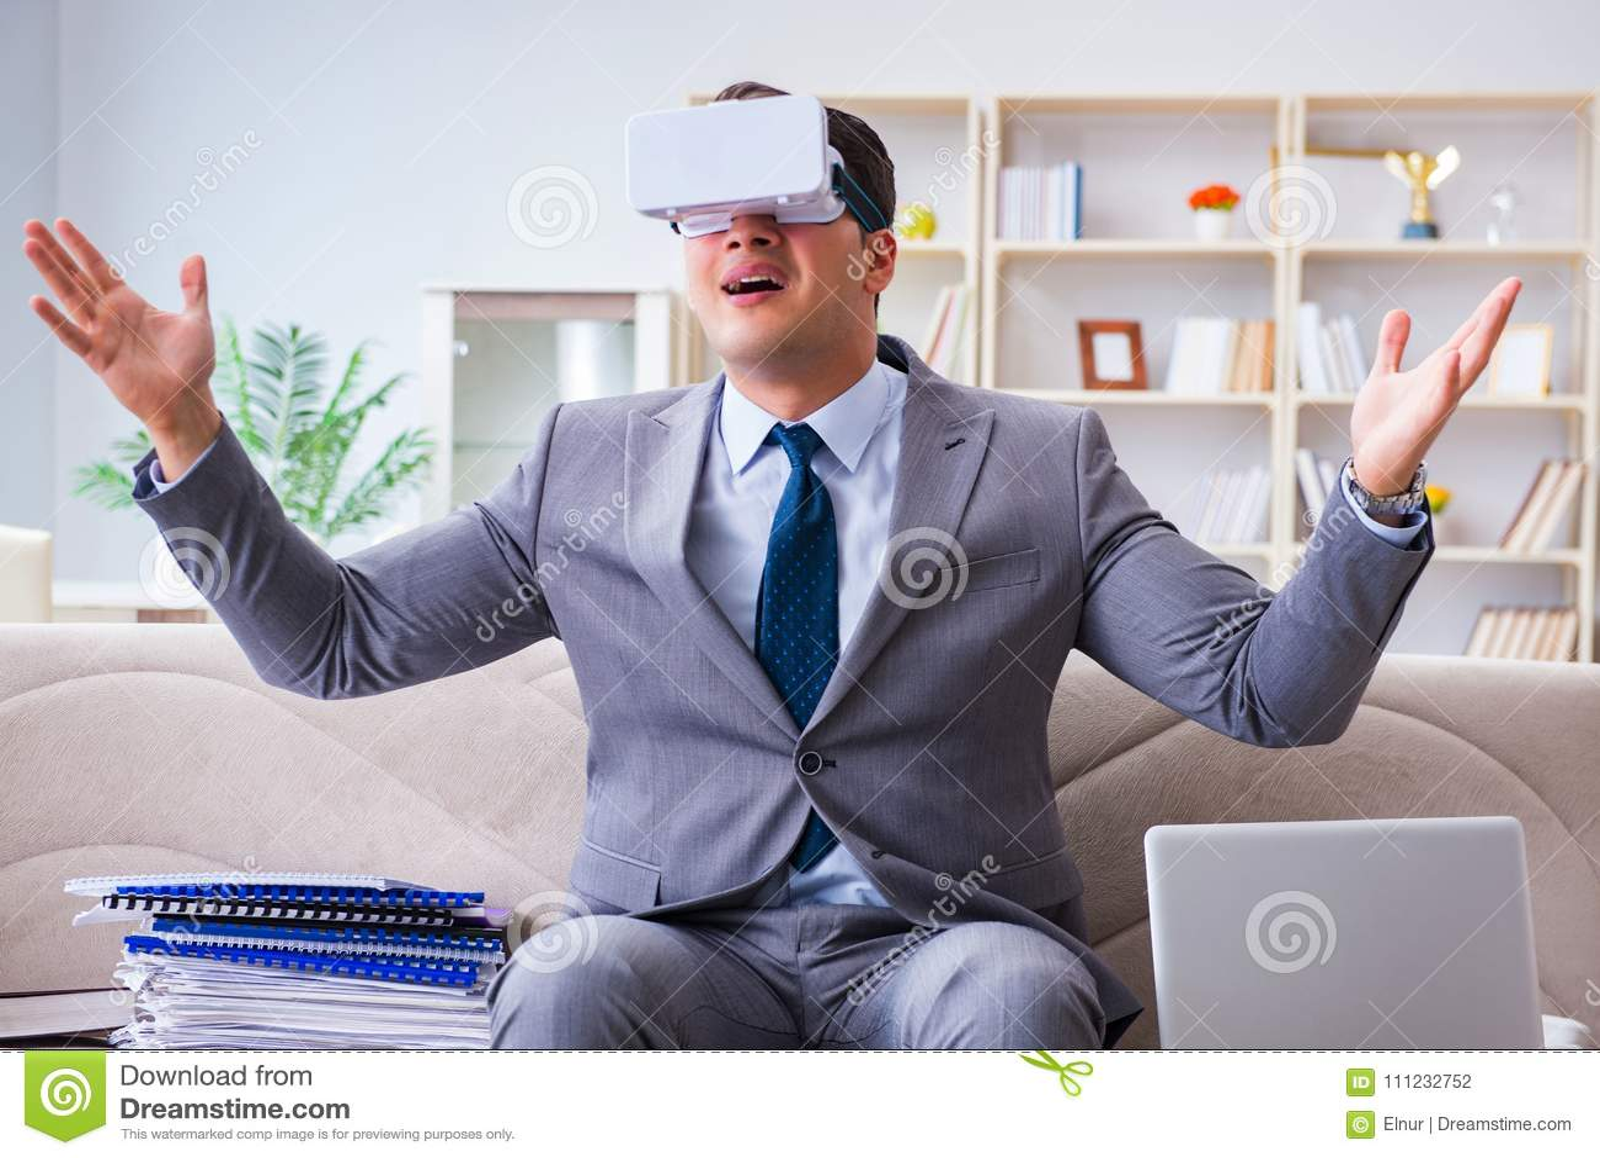 Zakenman met virtuele werkelijkheidsglazen in moderne mede technologie